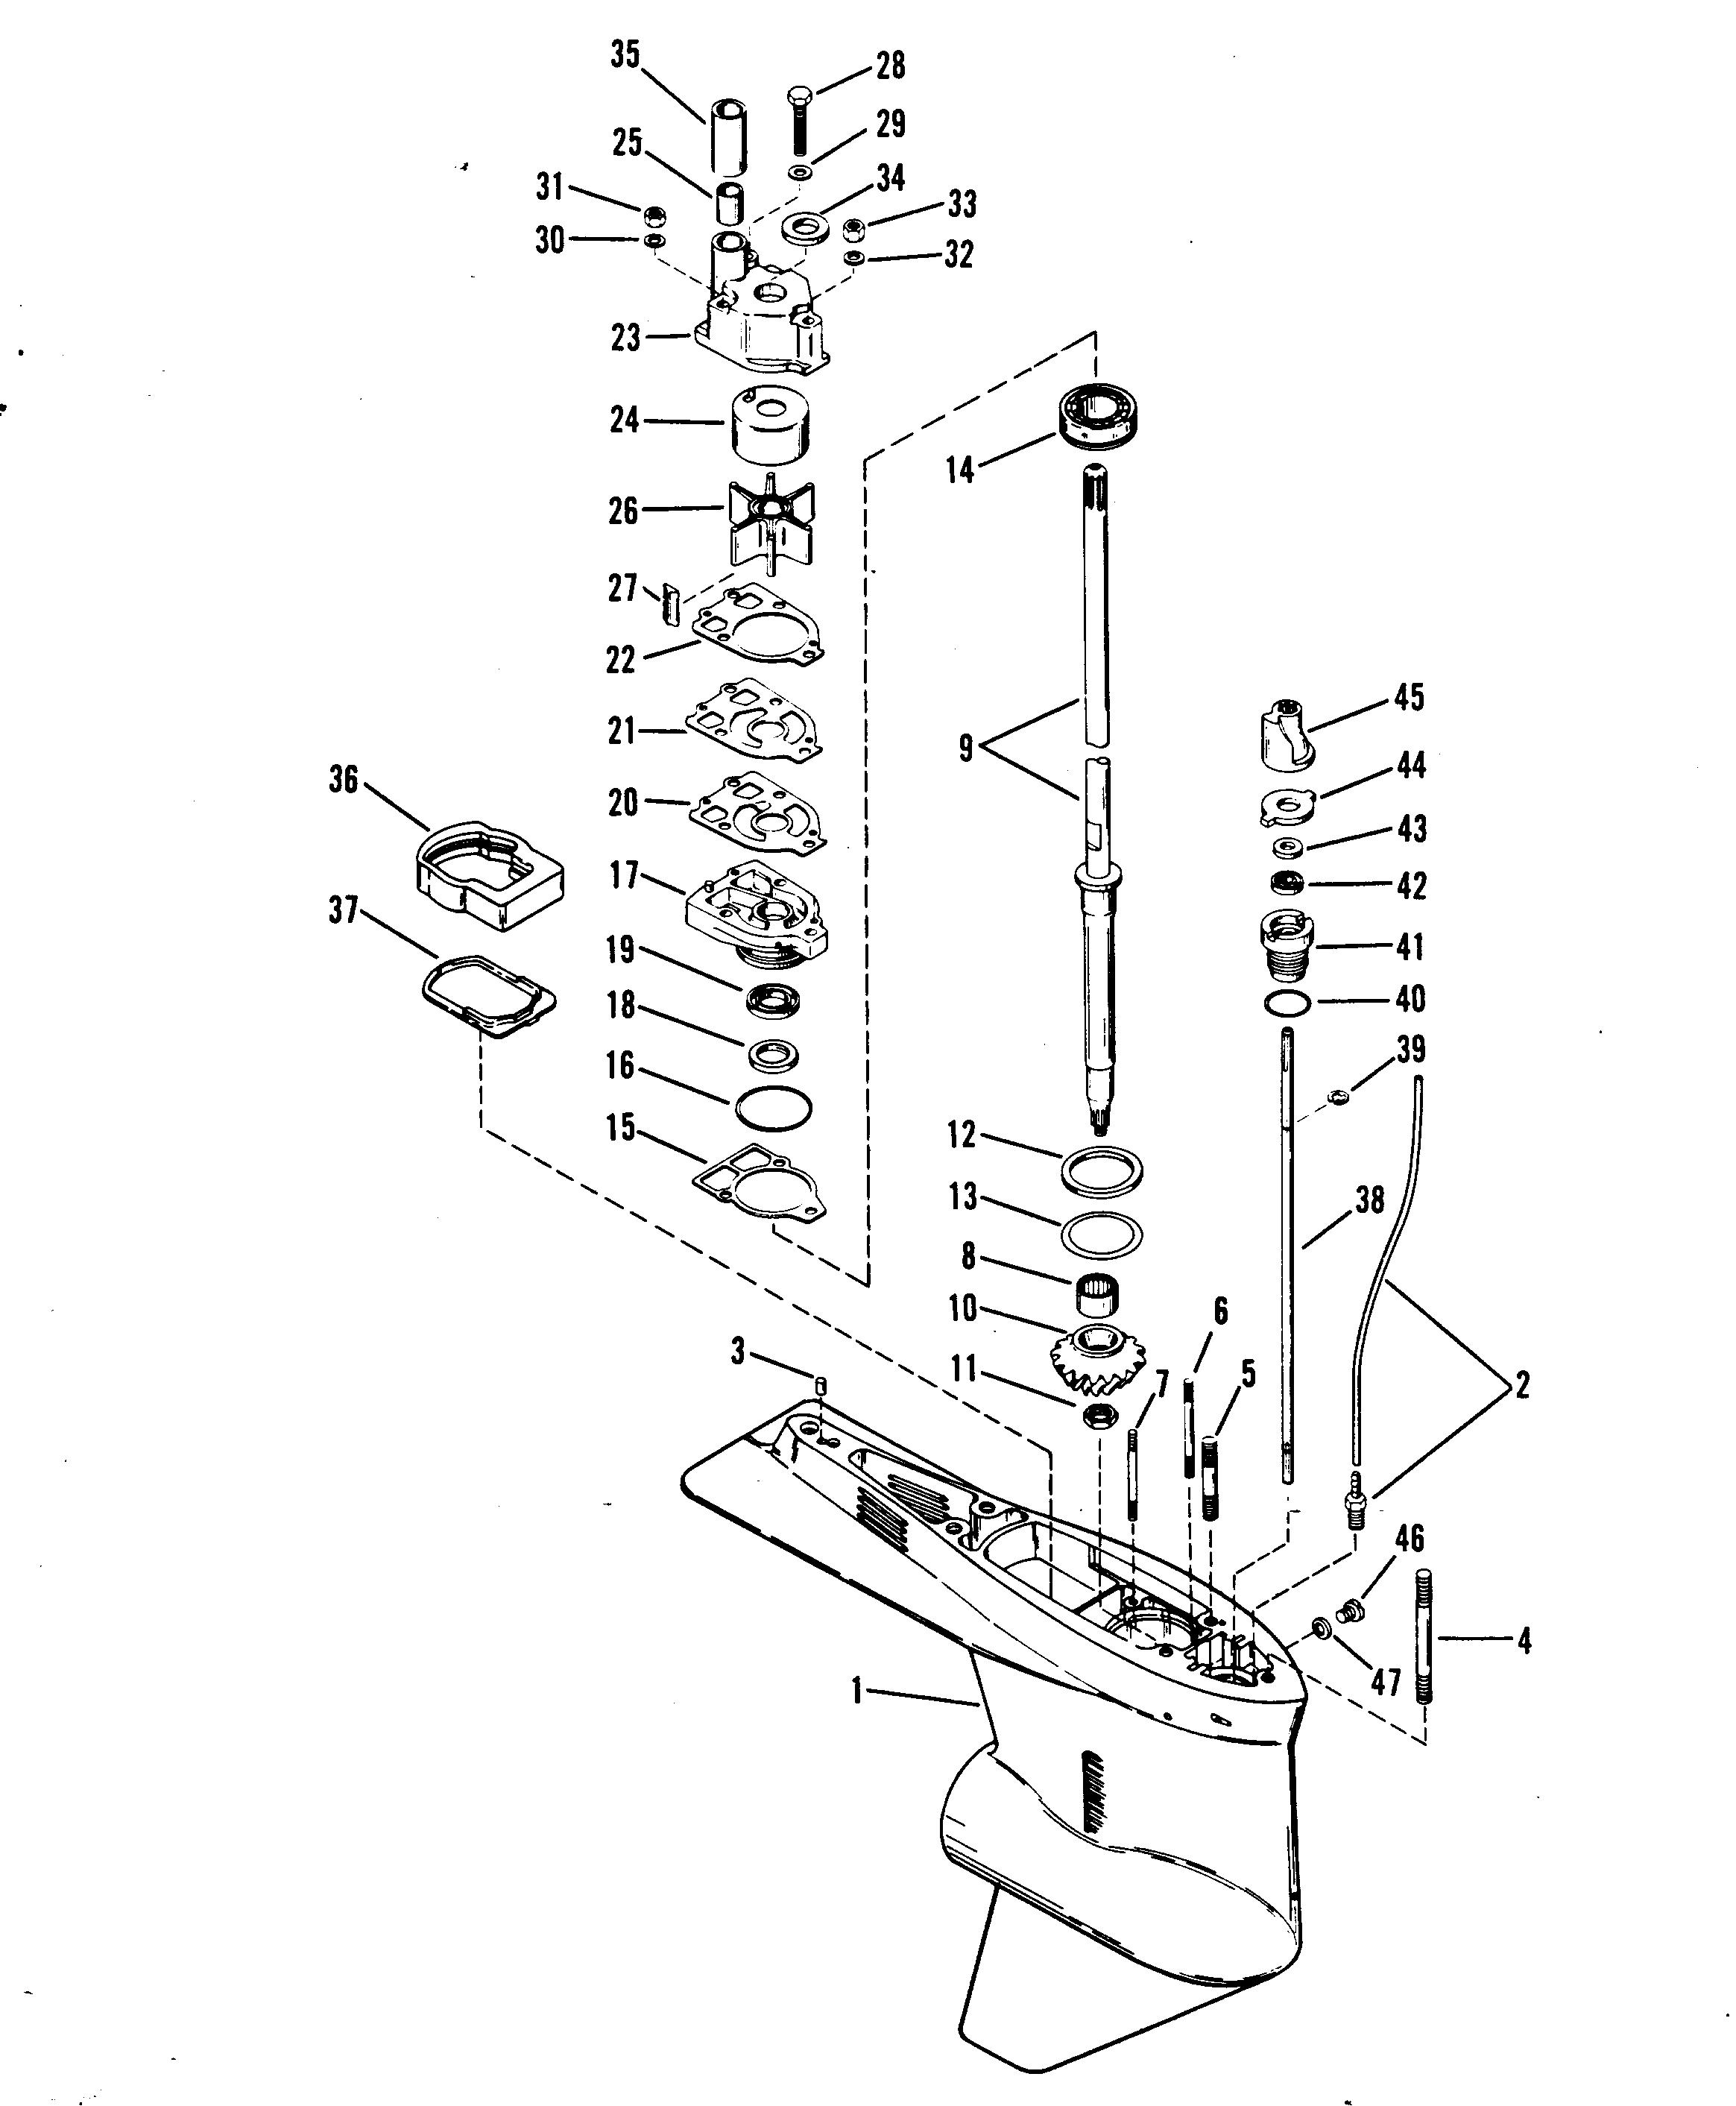 Diagram Of 1986 Mariner Outboard 7075716 Gear Housing Propeller